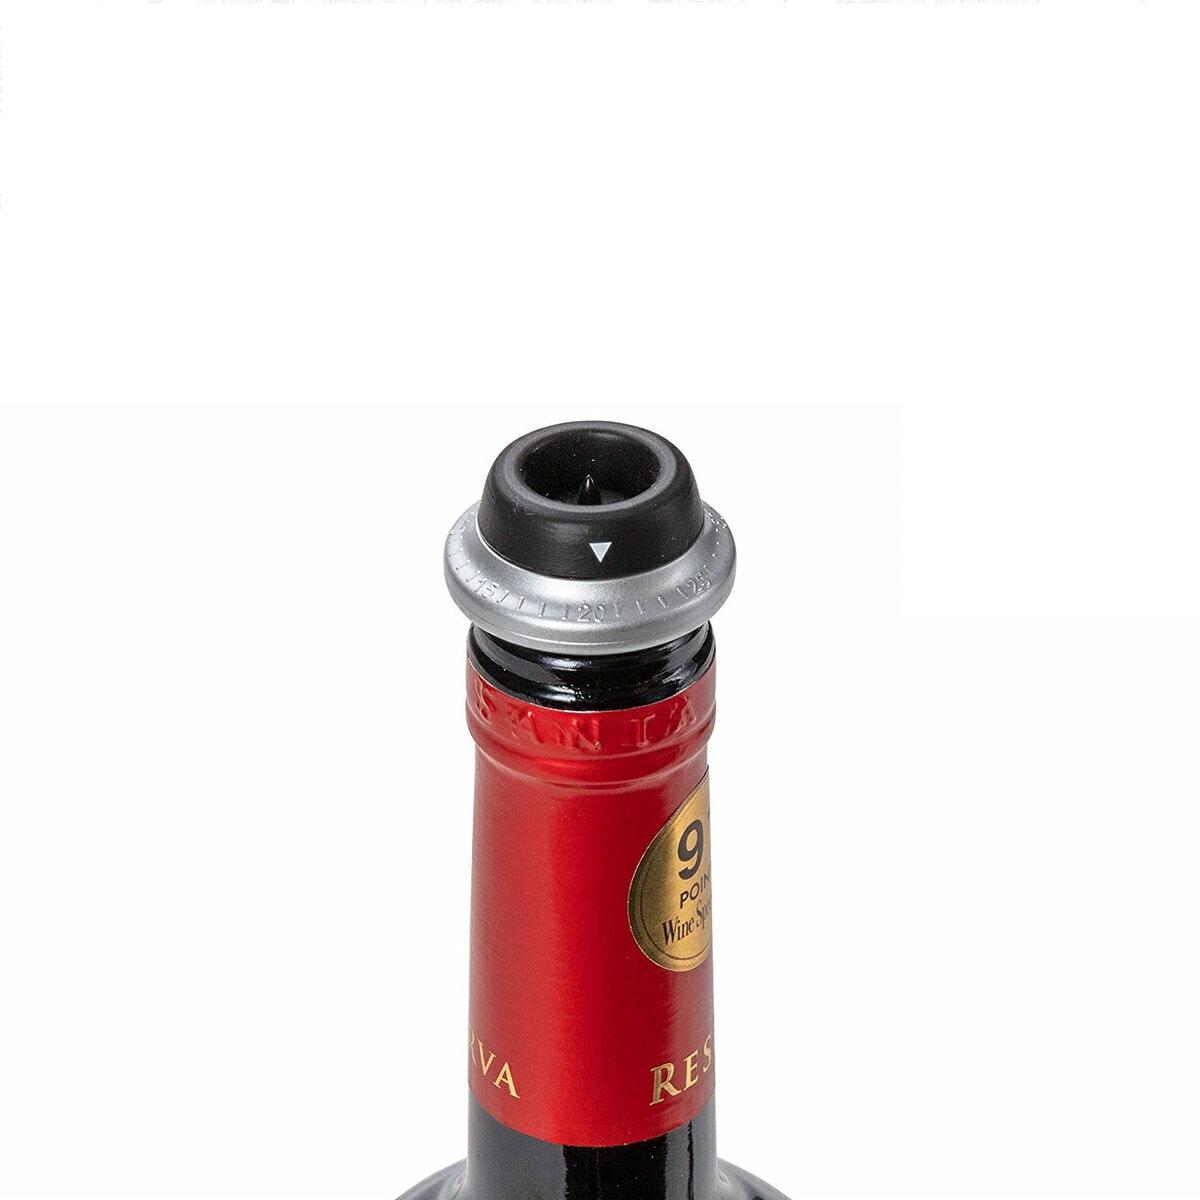 CheerModa『電動ワインオープナーセットUSB充電式』